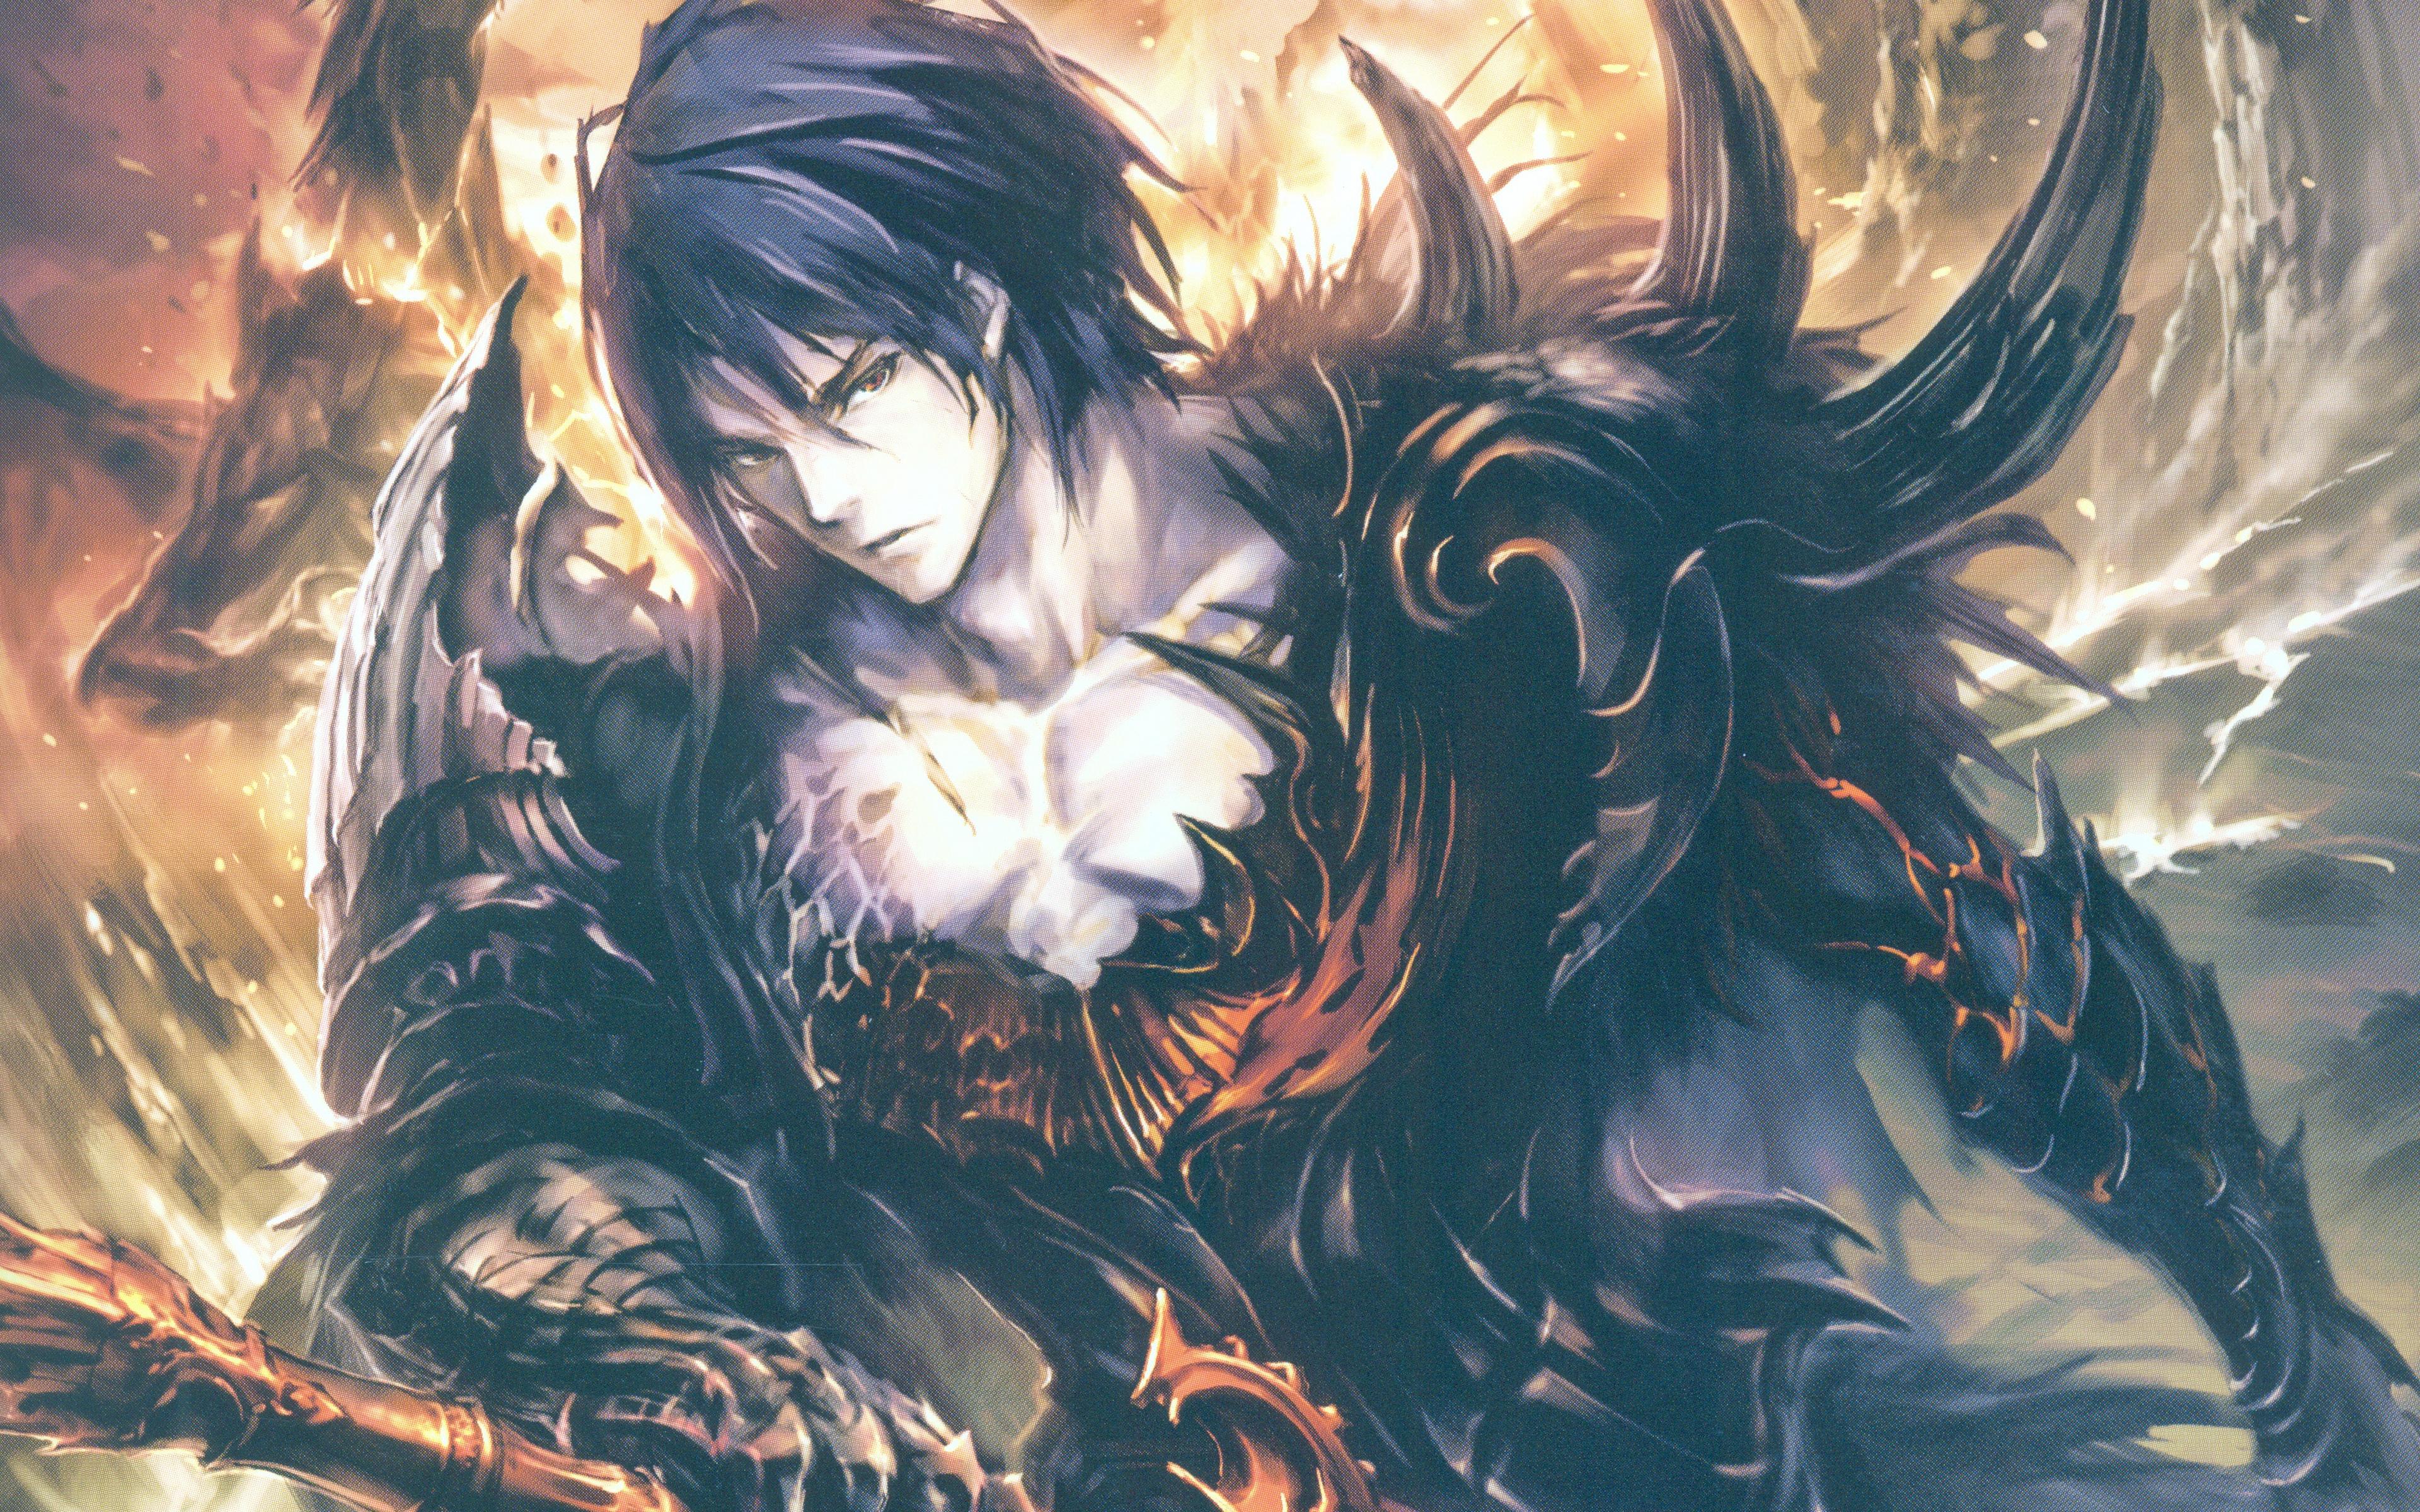 Beowulf 4k Rage Of Bahamut Shingeki No Bahamut Loki Shingeki